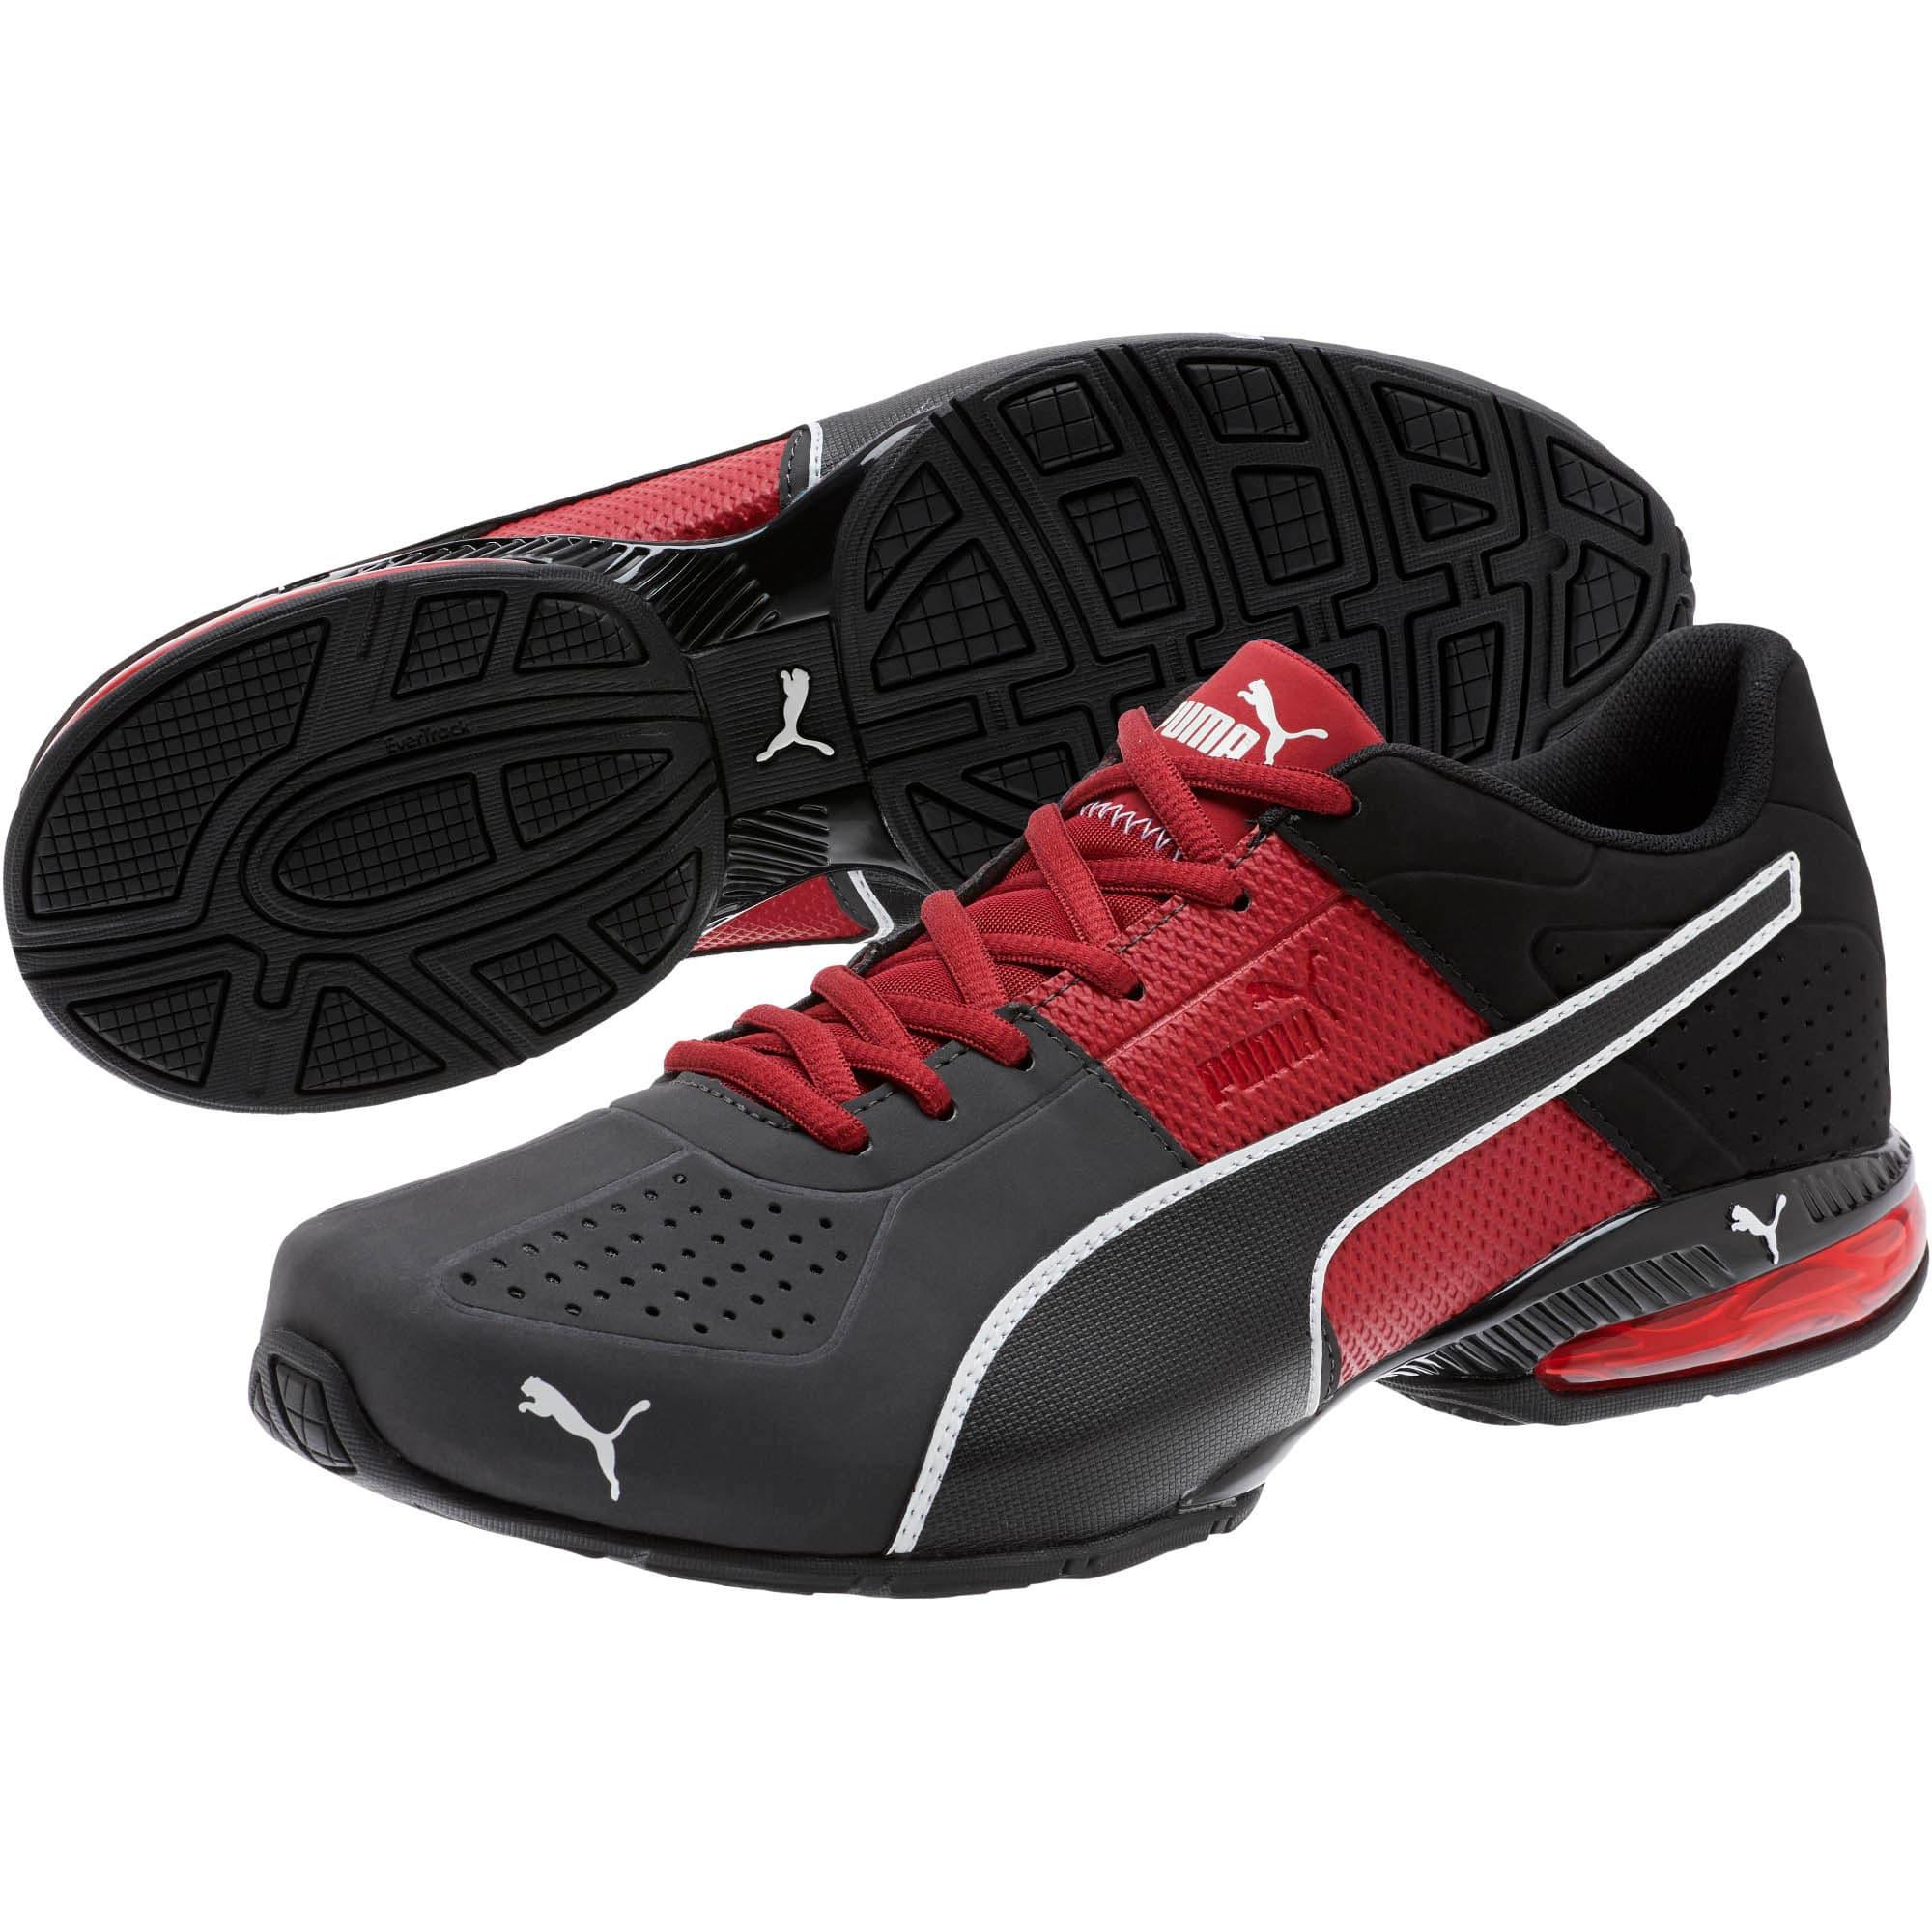 Thumbnail 2 of CELL Surin 2 Matte Men's Training Shoes, Rhubarb-Puma White, medium